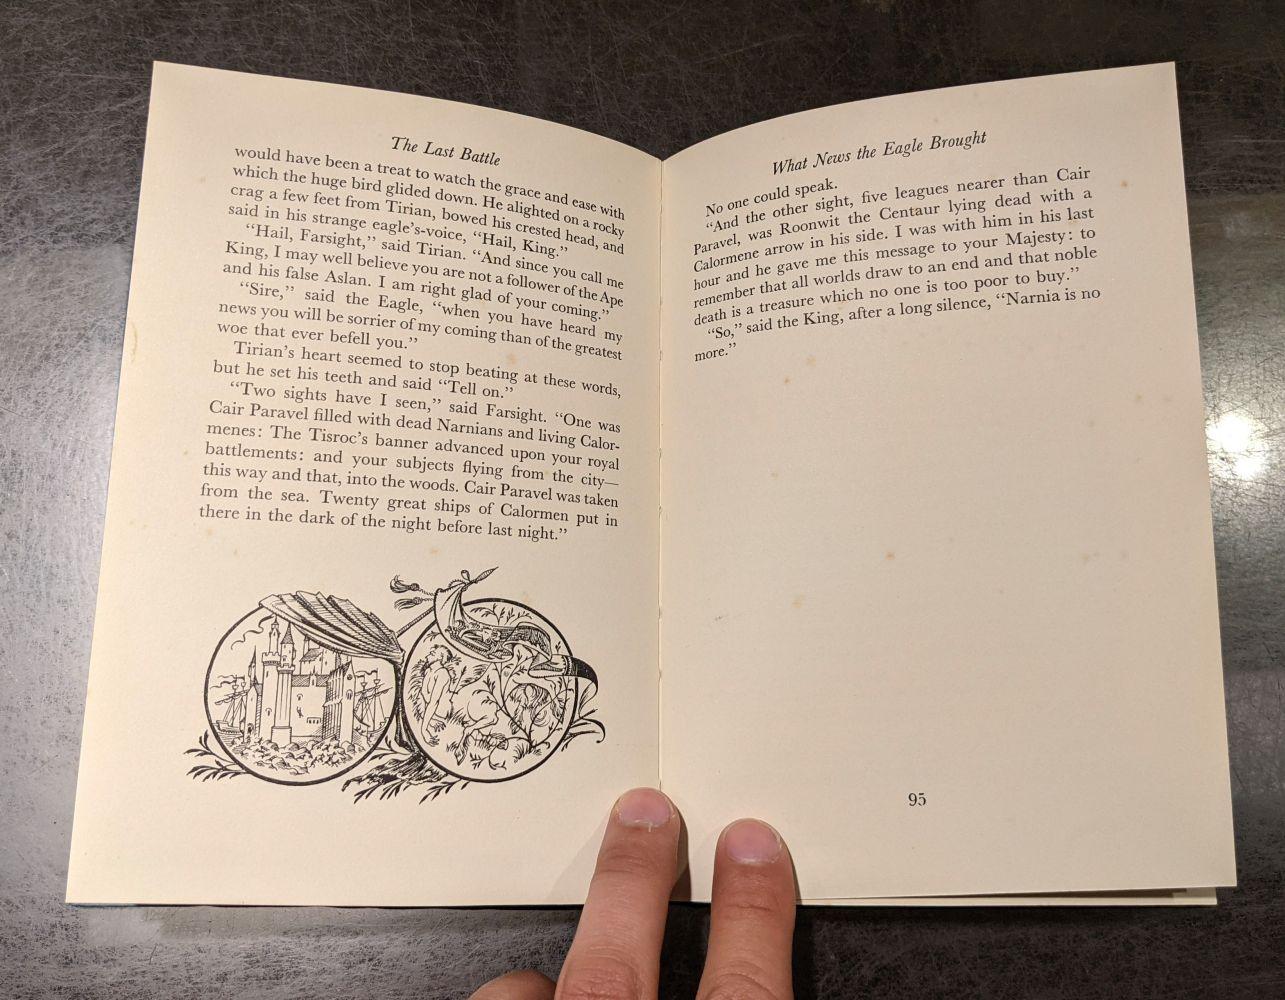 Lewis (C.S.) The Last Battle, 1st edition, 1956 - Image 9 of 9